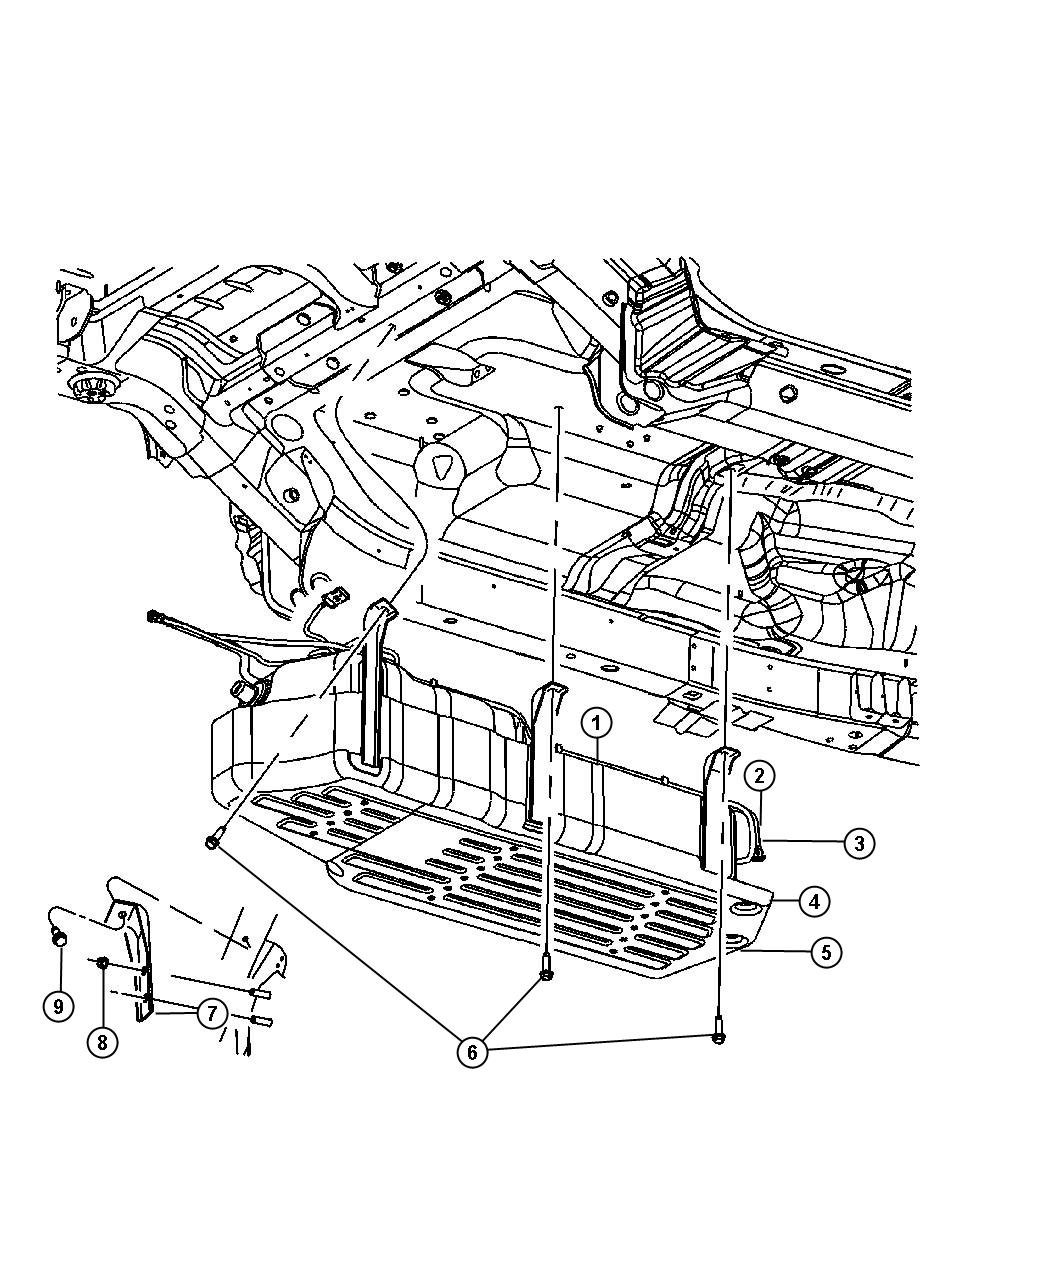 2008 jeep grand cherokee tube  fuel module to supply line  tank  gallon  skid